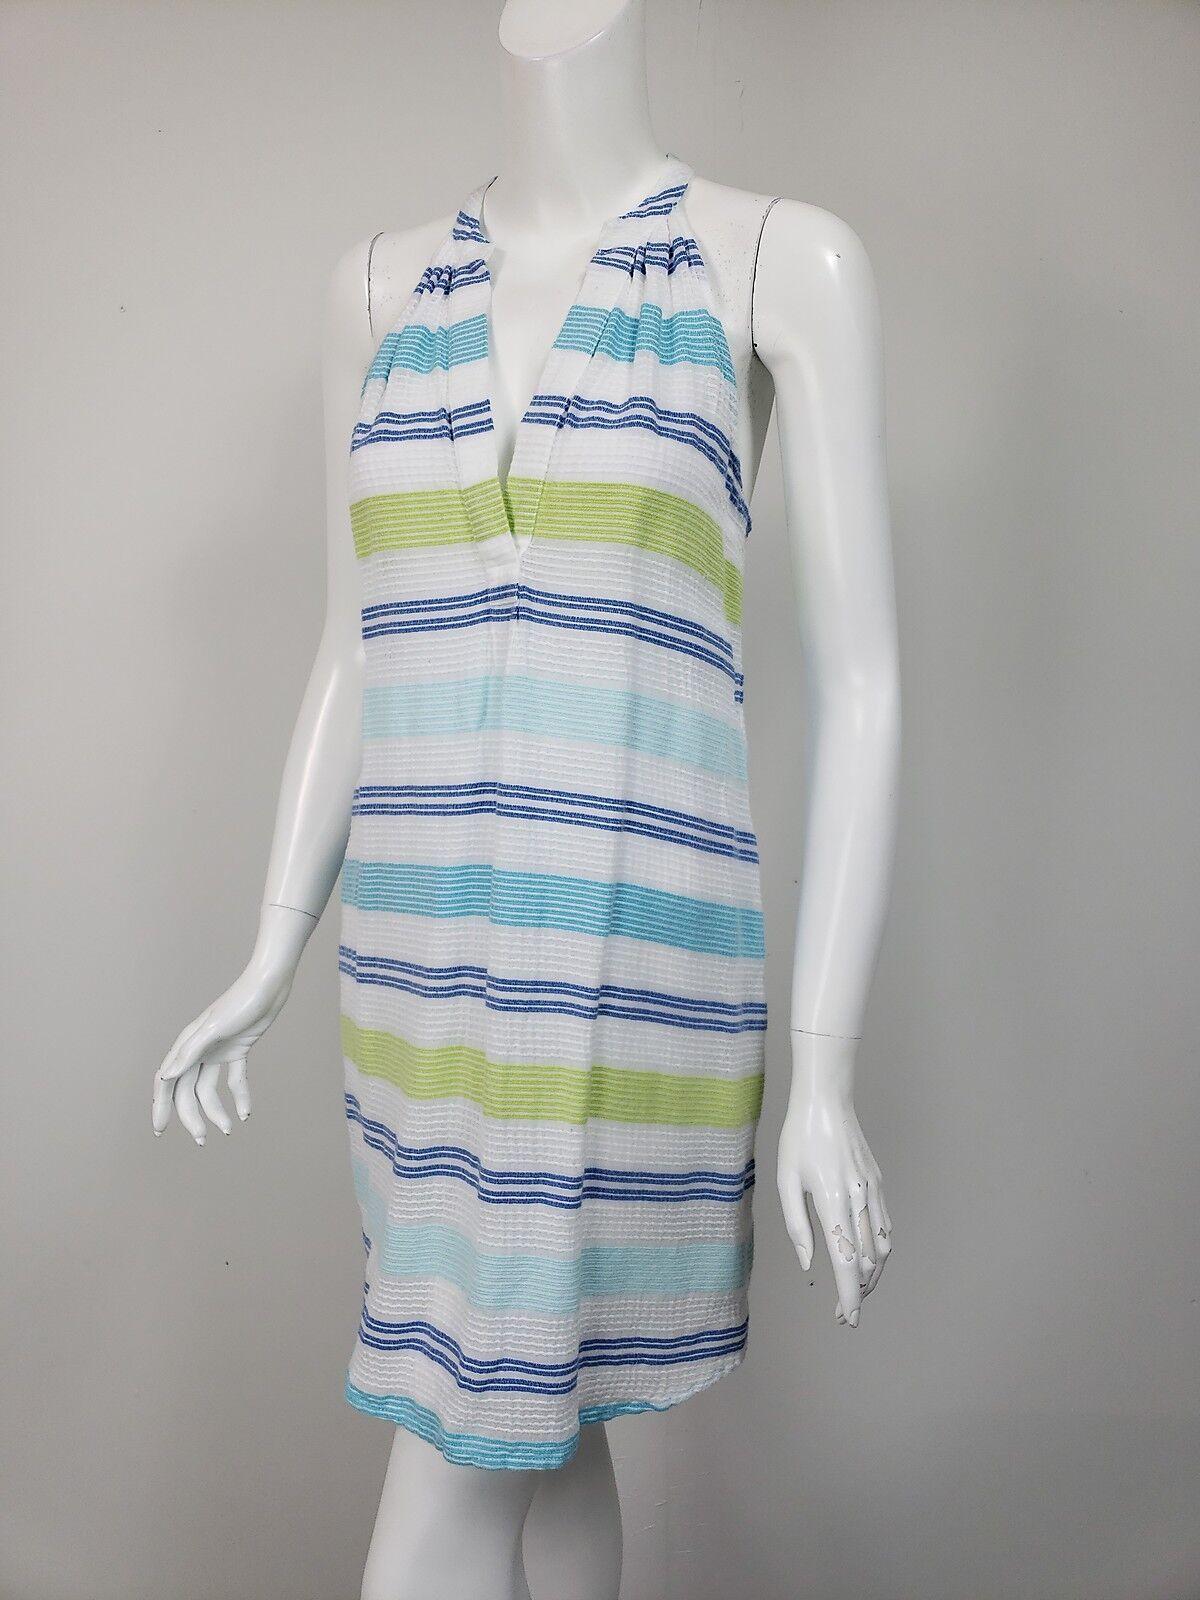 VINEYARD VINES White Aqua bluee Lime Stripe Gauzy Cotton Tunic Dress sz XS